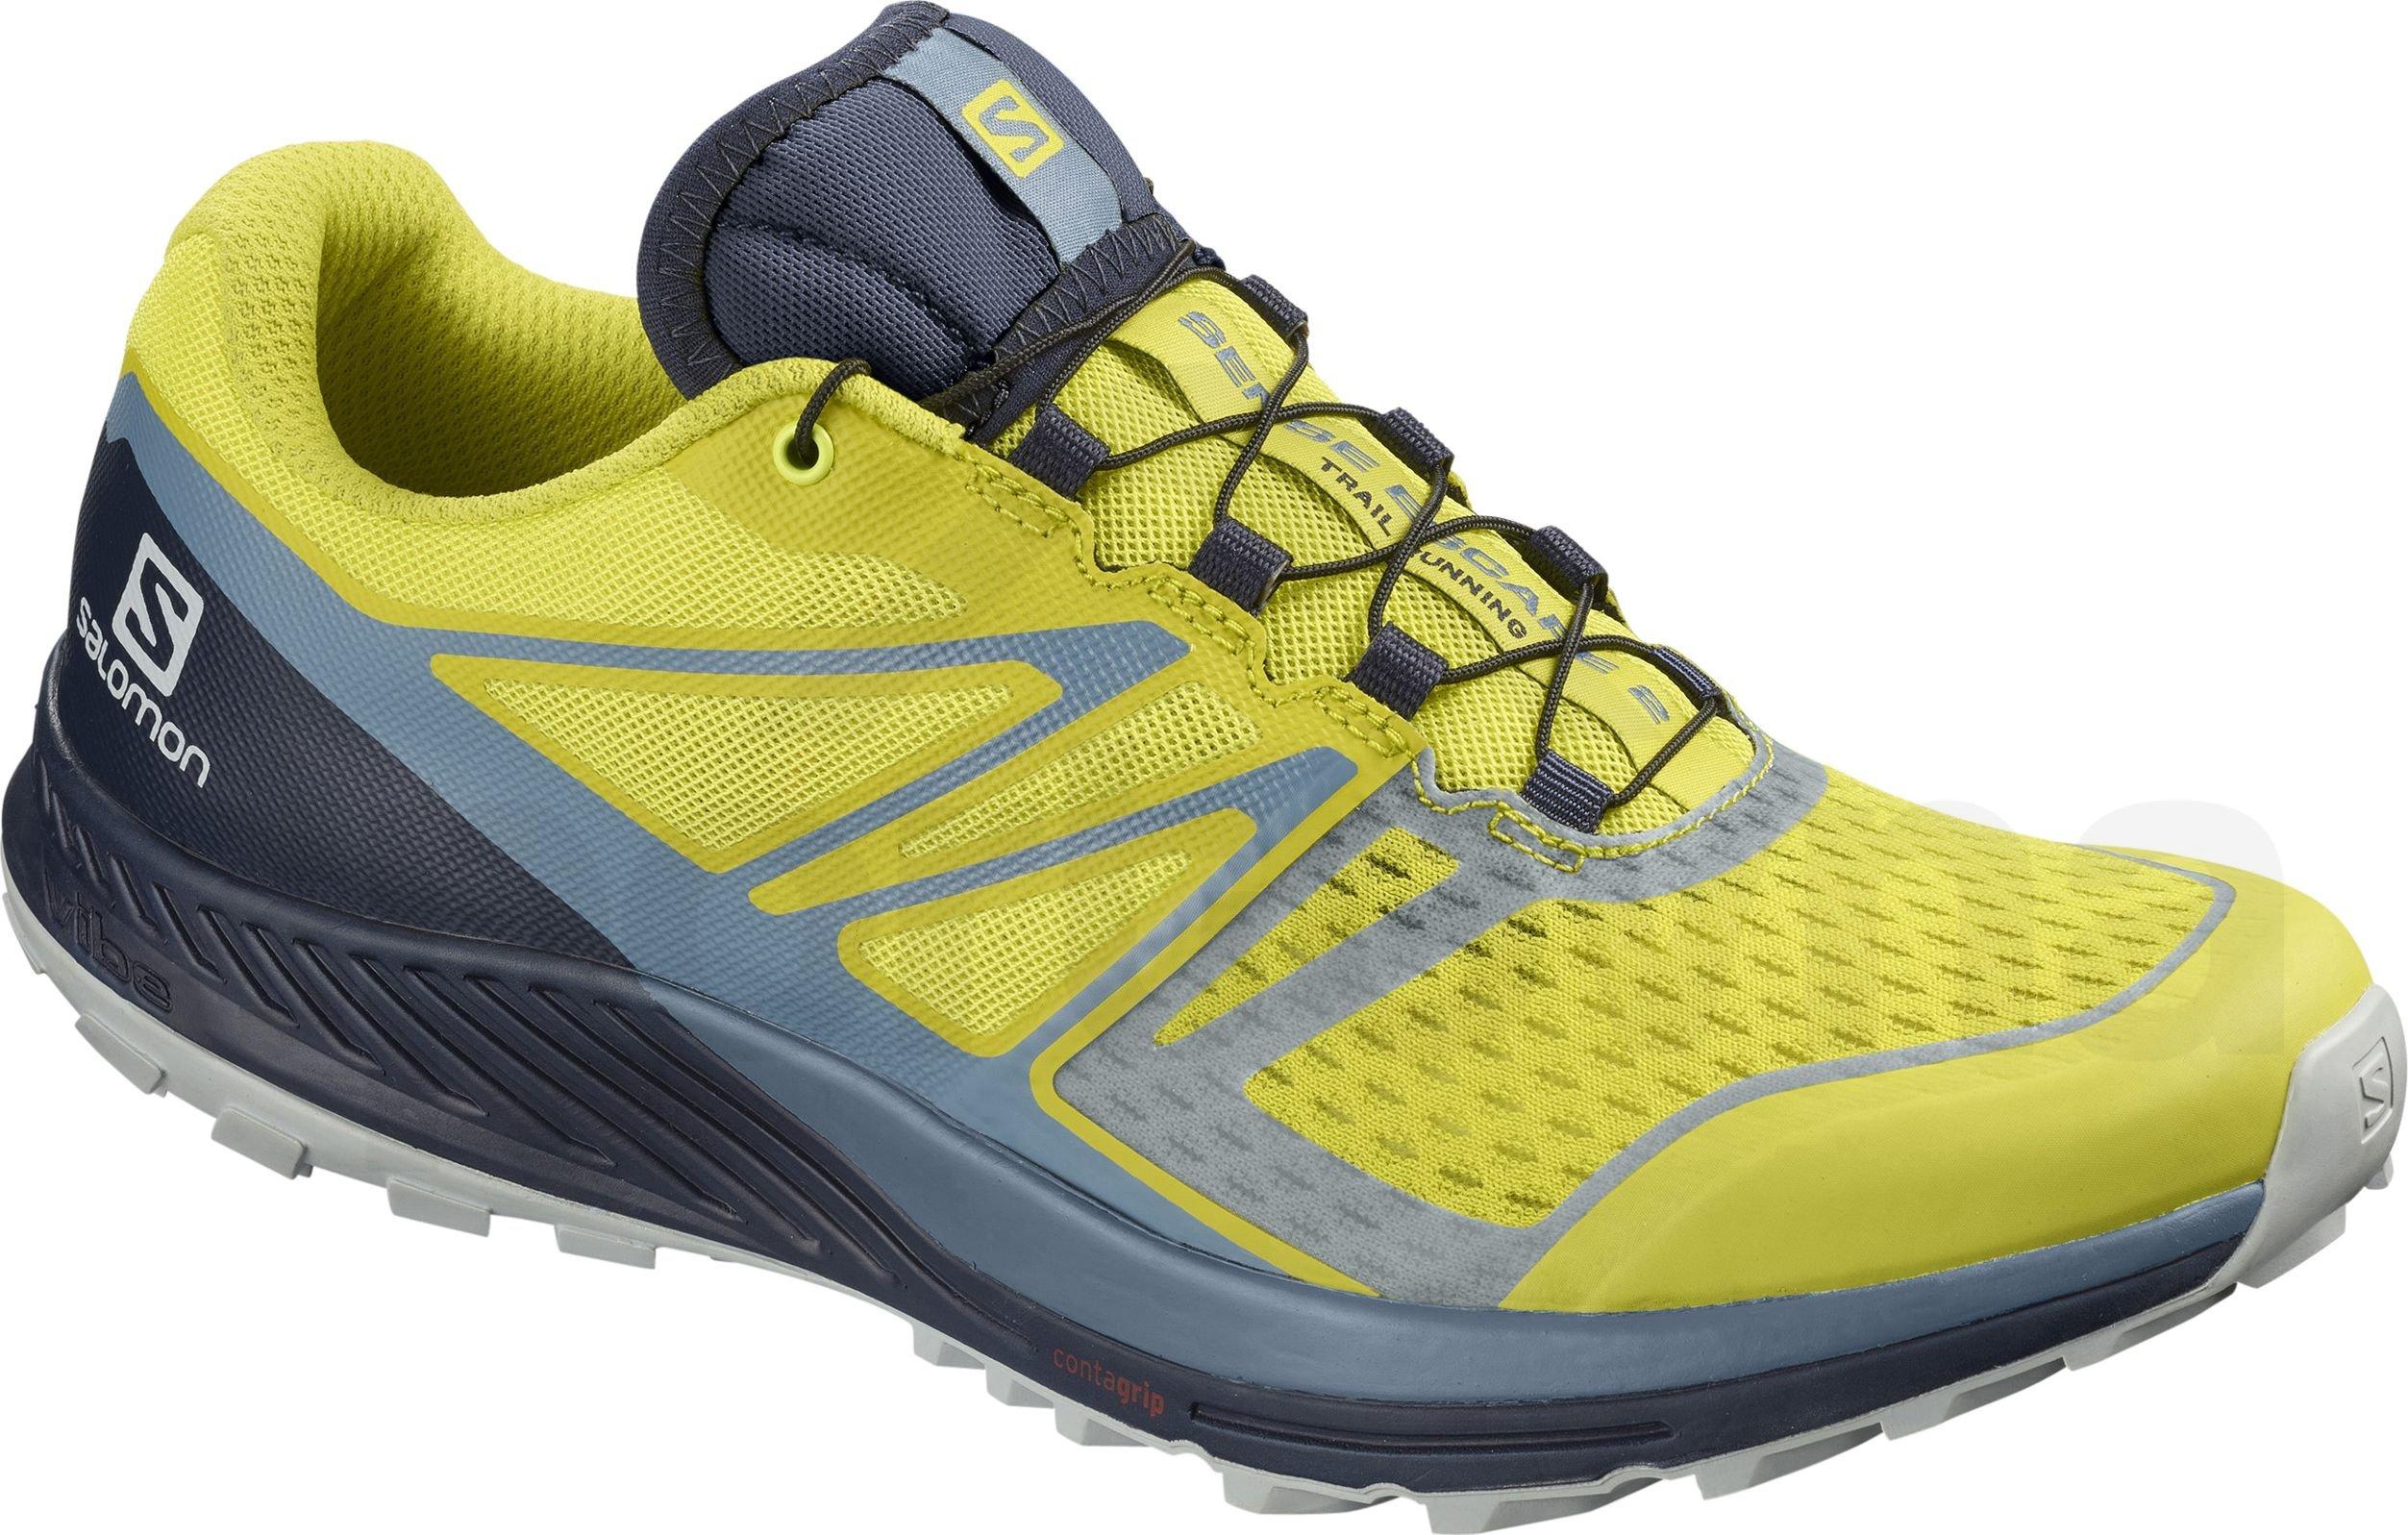 c276c61900b5 Pánská trailová běžecká obuv Salomon SENSE RIDE 2 Blue orange ...